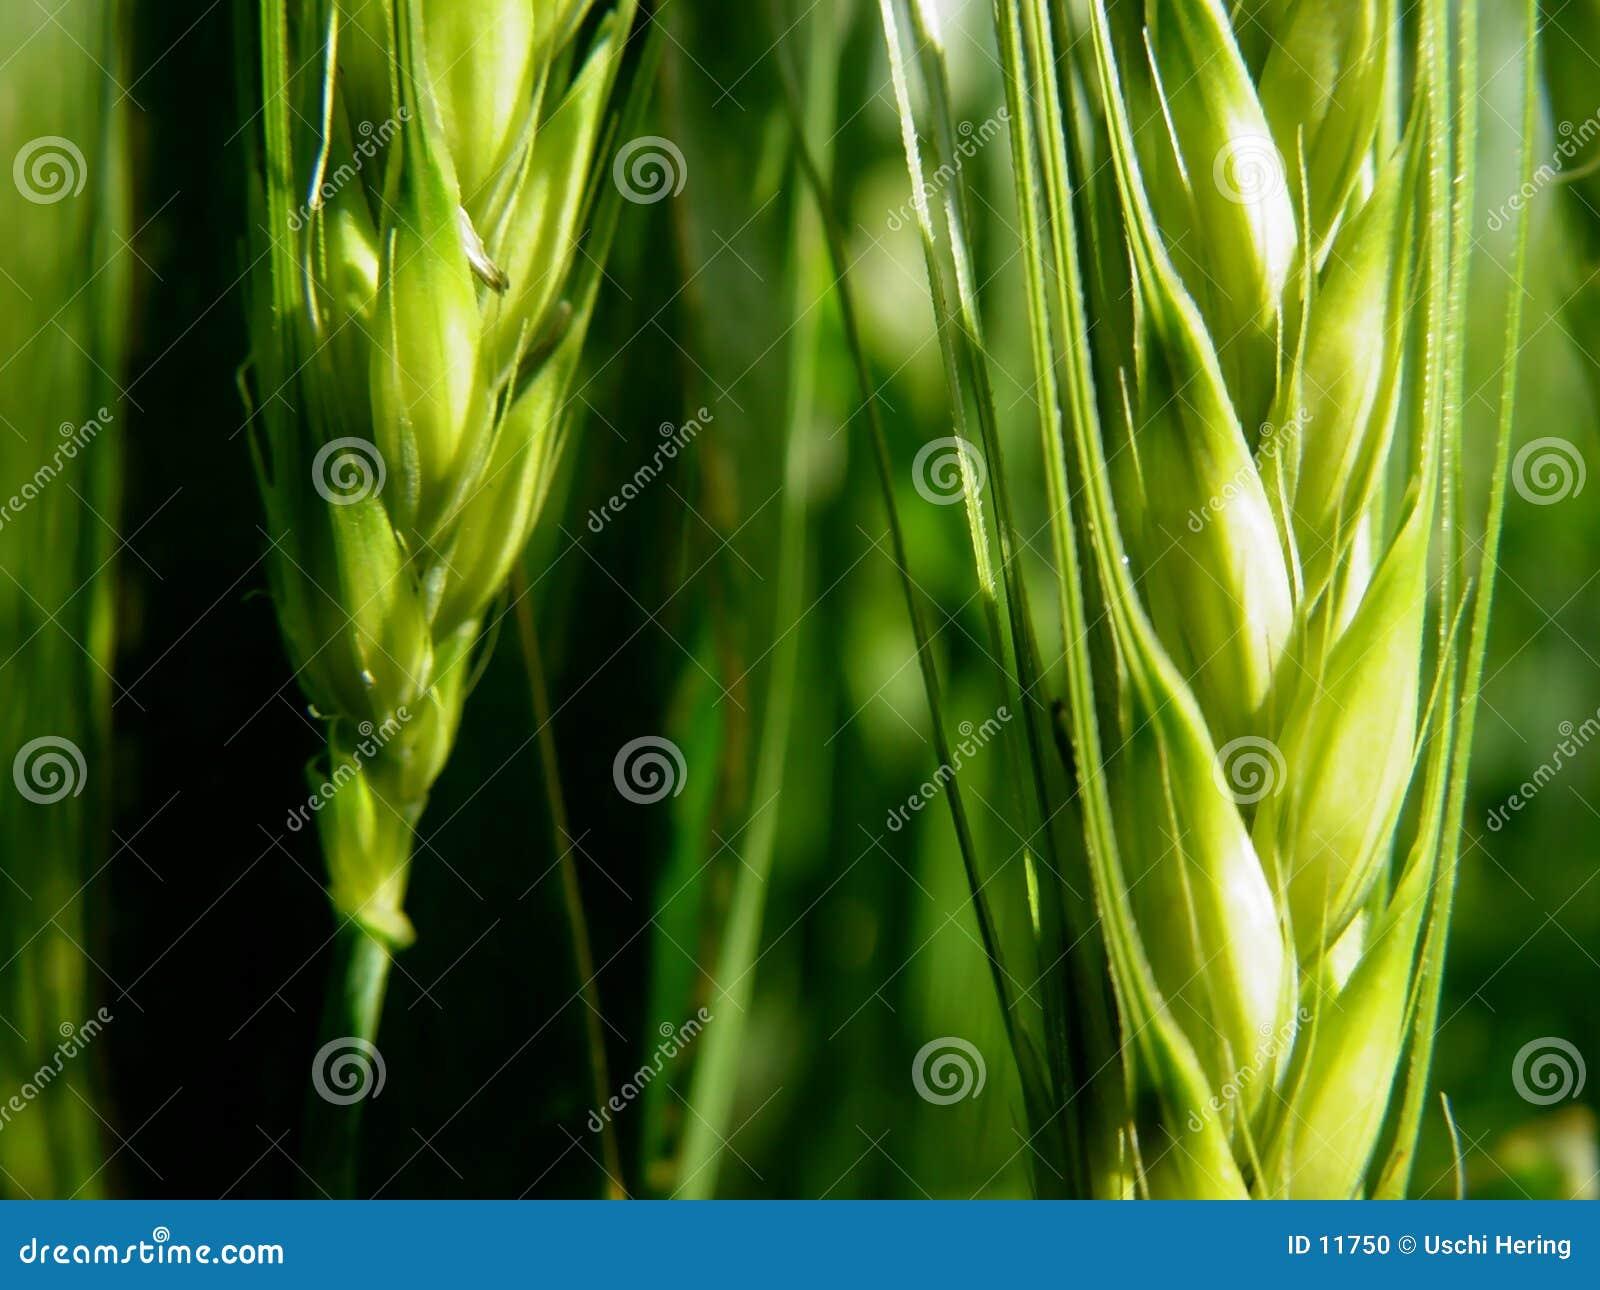 barley ears